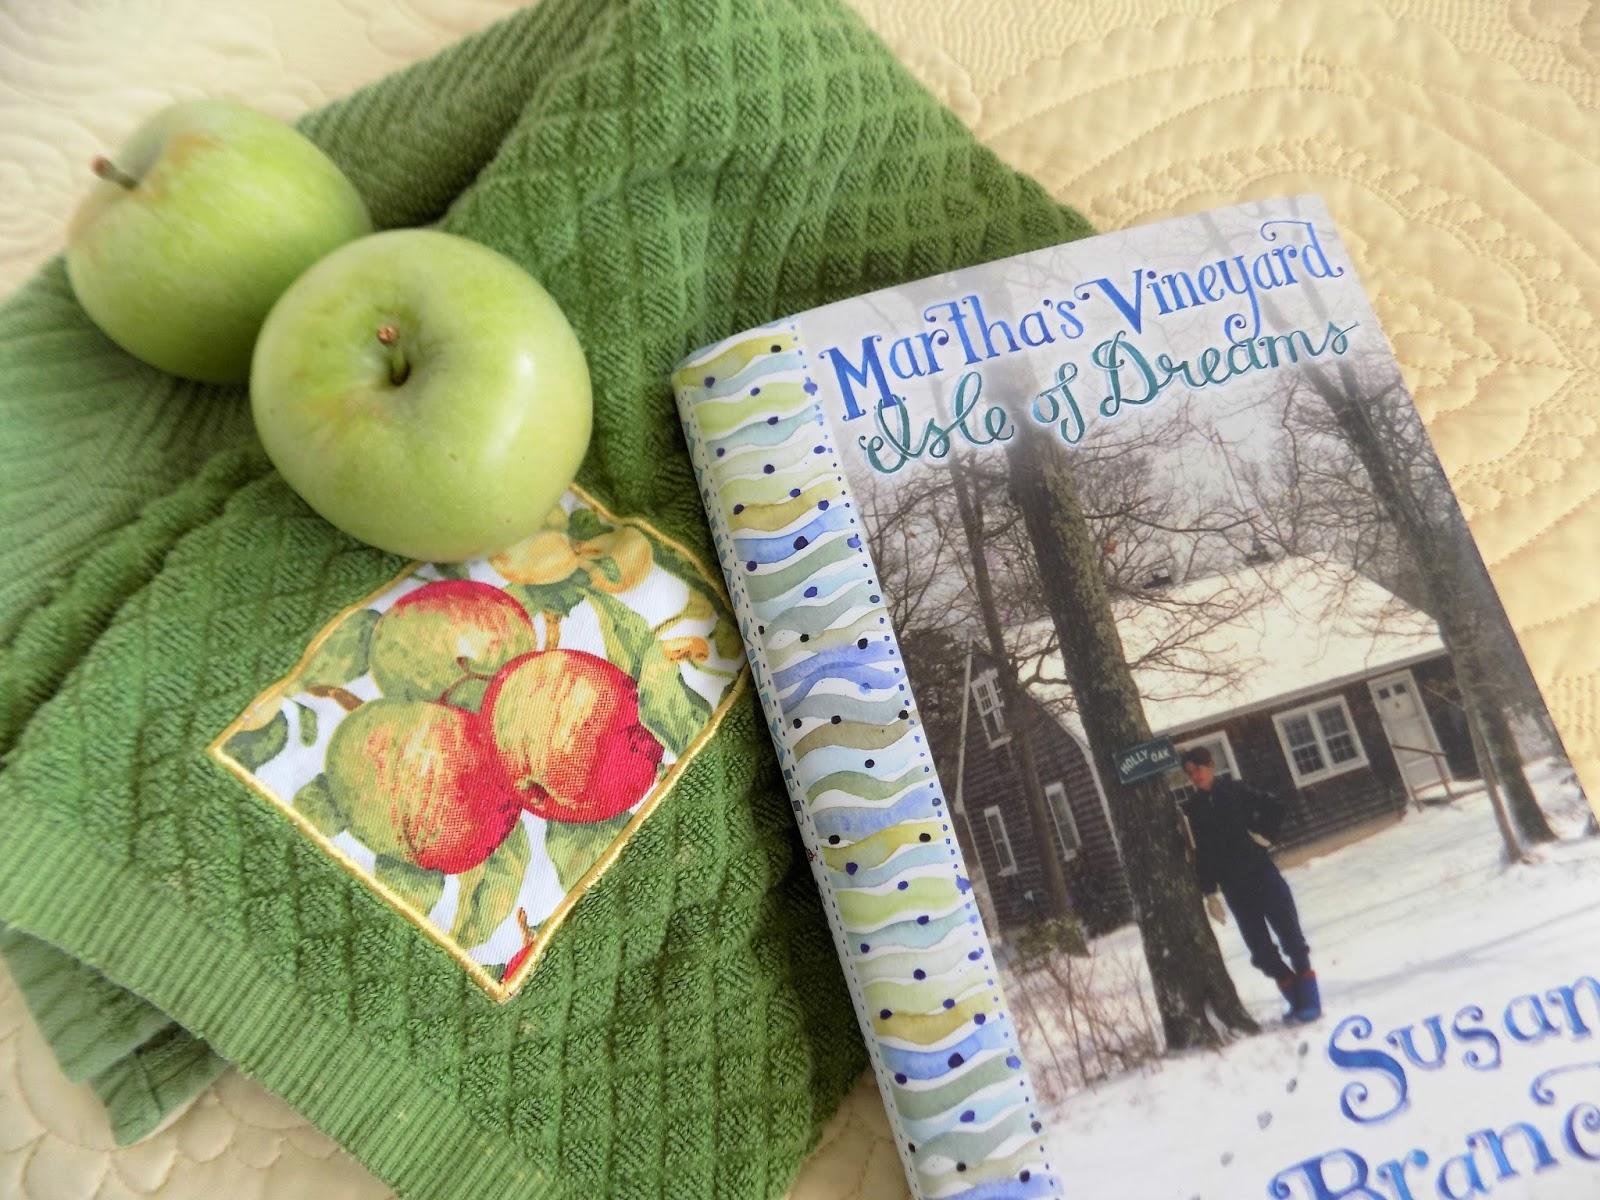 Marthas Vineyard - Isle of Dreams